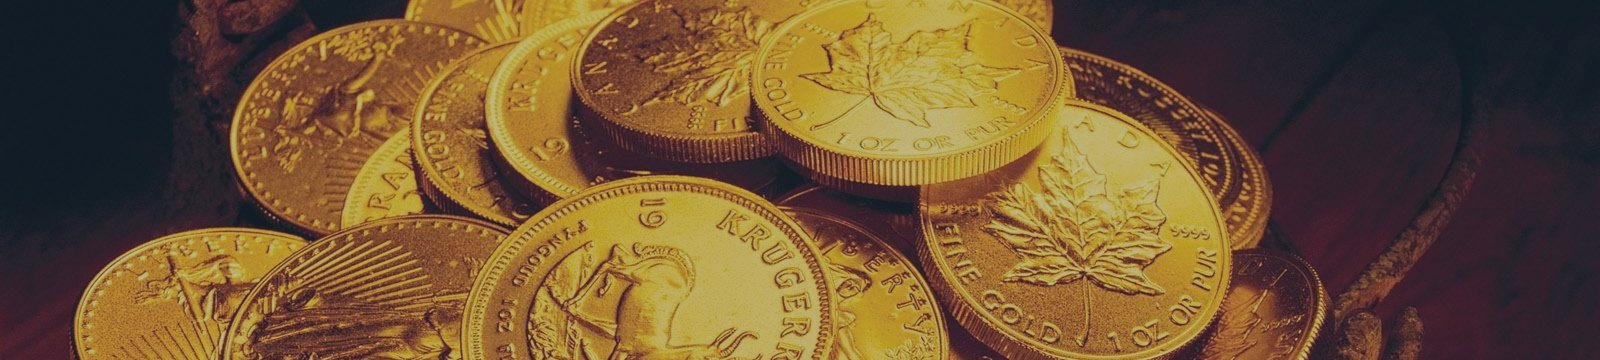 Oro Análisis Fundamental 17 Septiembre 2014, Pronóstico